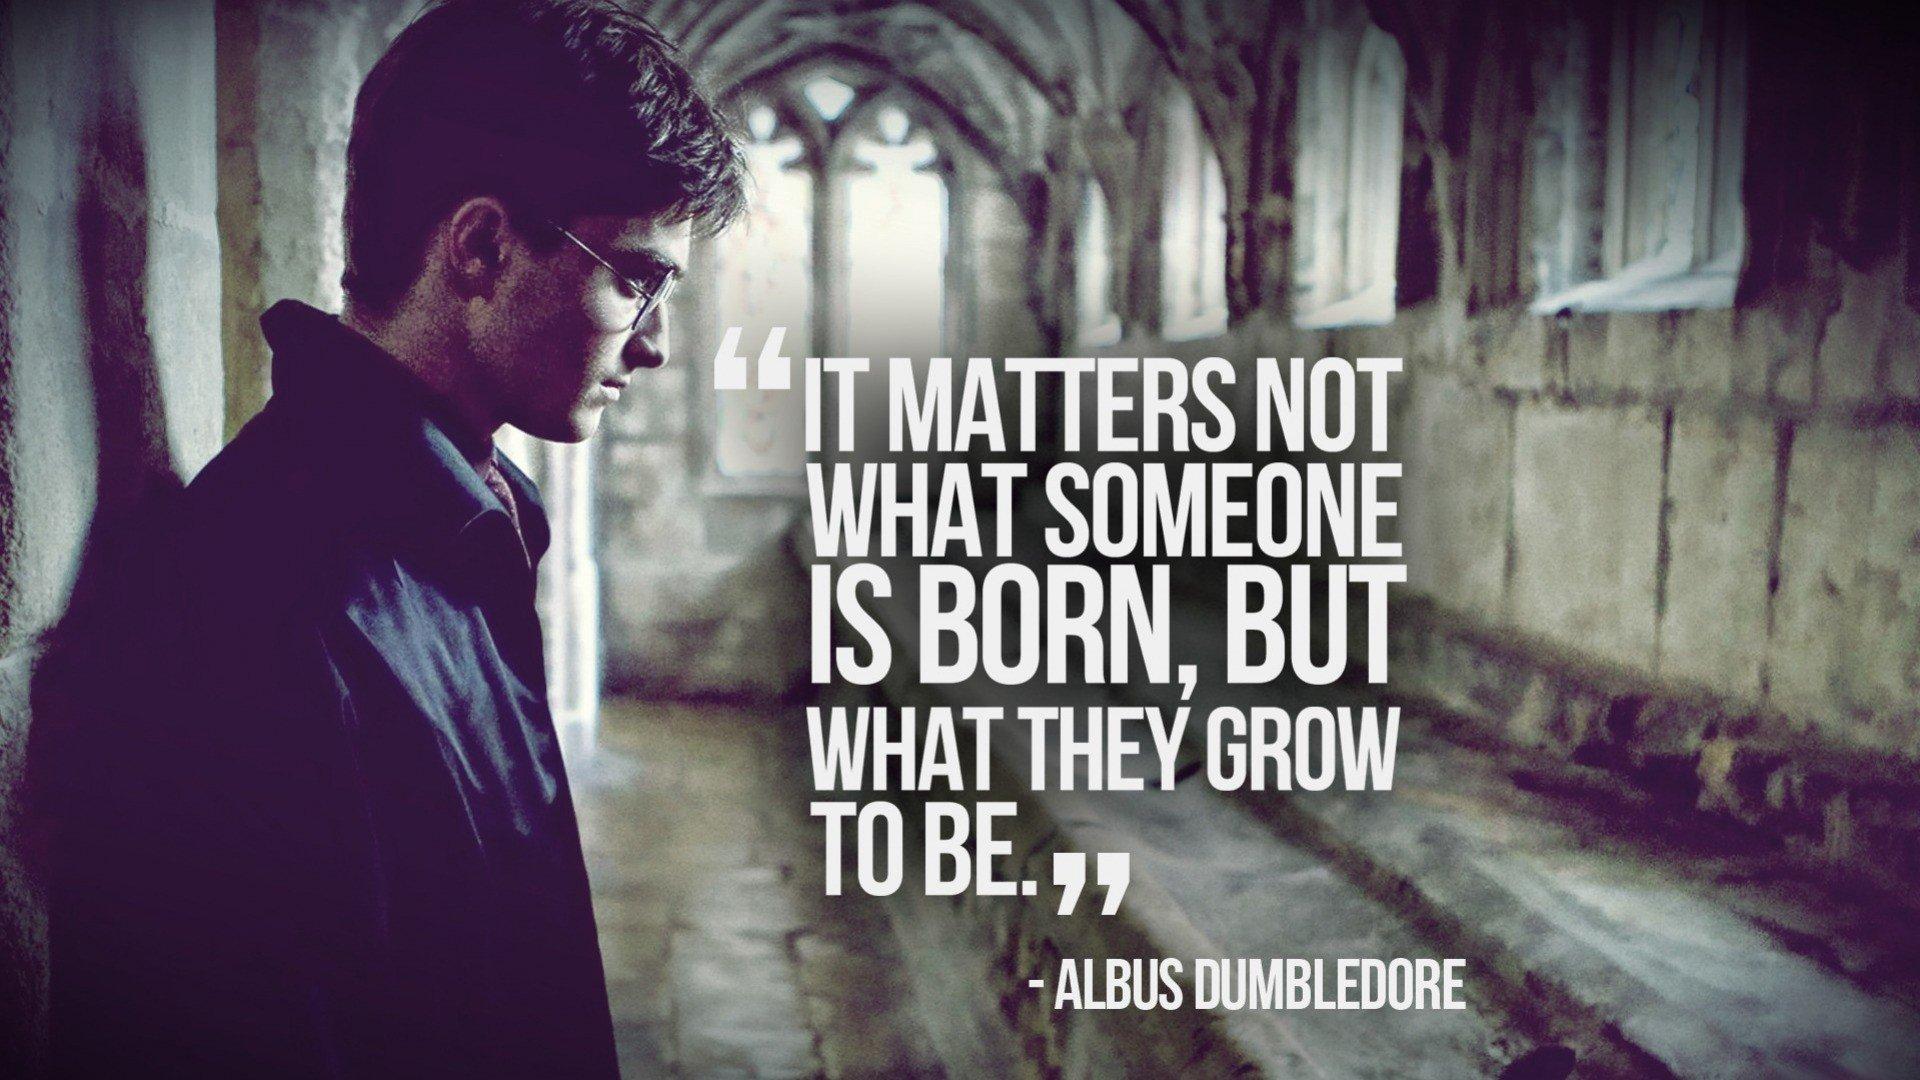 Hintergrundbilder 1920x1080 Px Albus Daniel Dumbledore